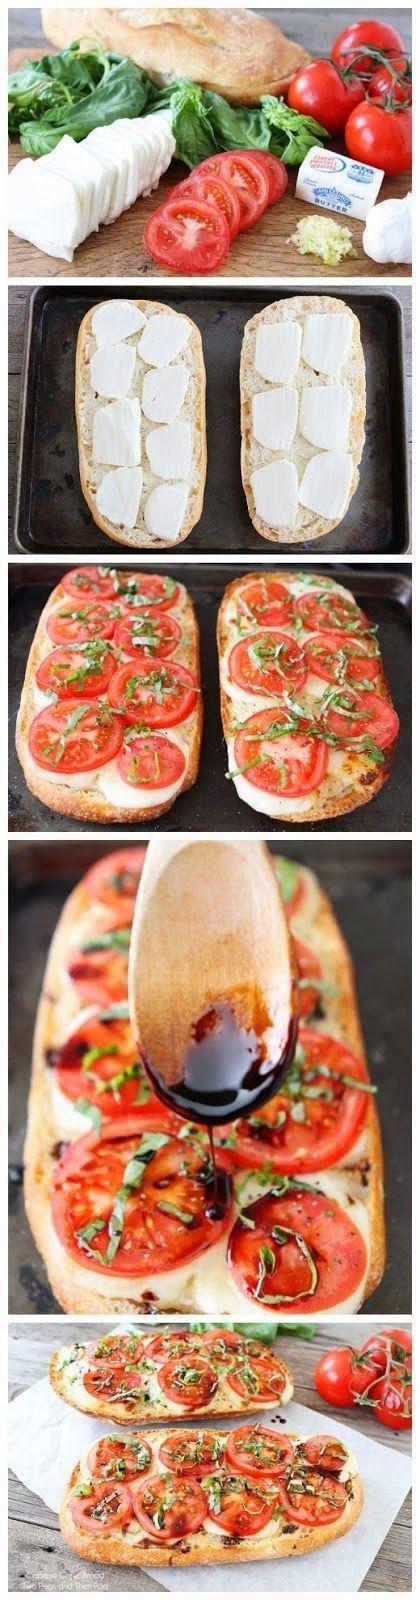 Caprese Garlic Bread - Plan Provision